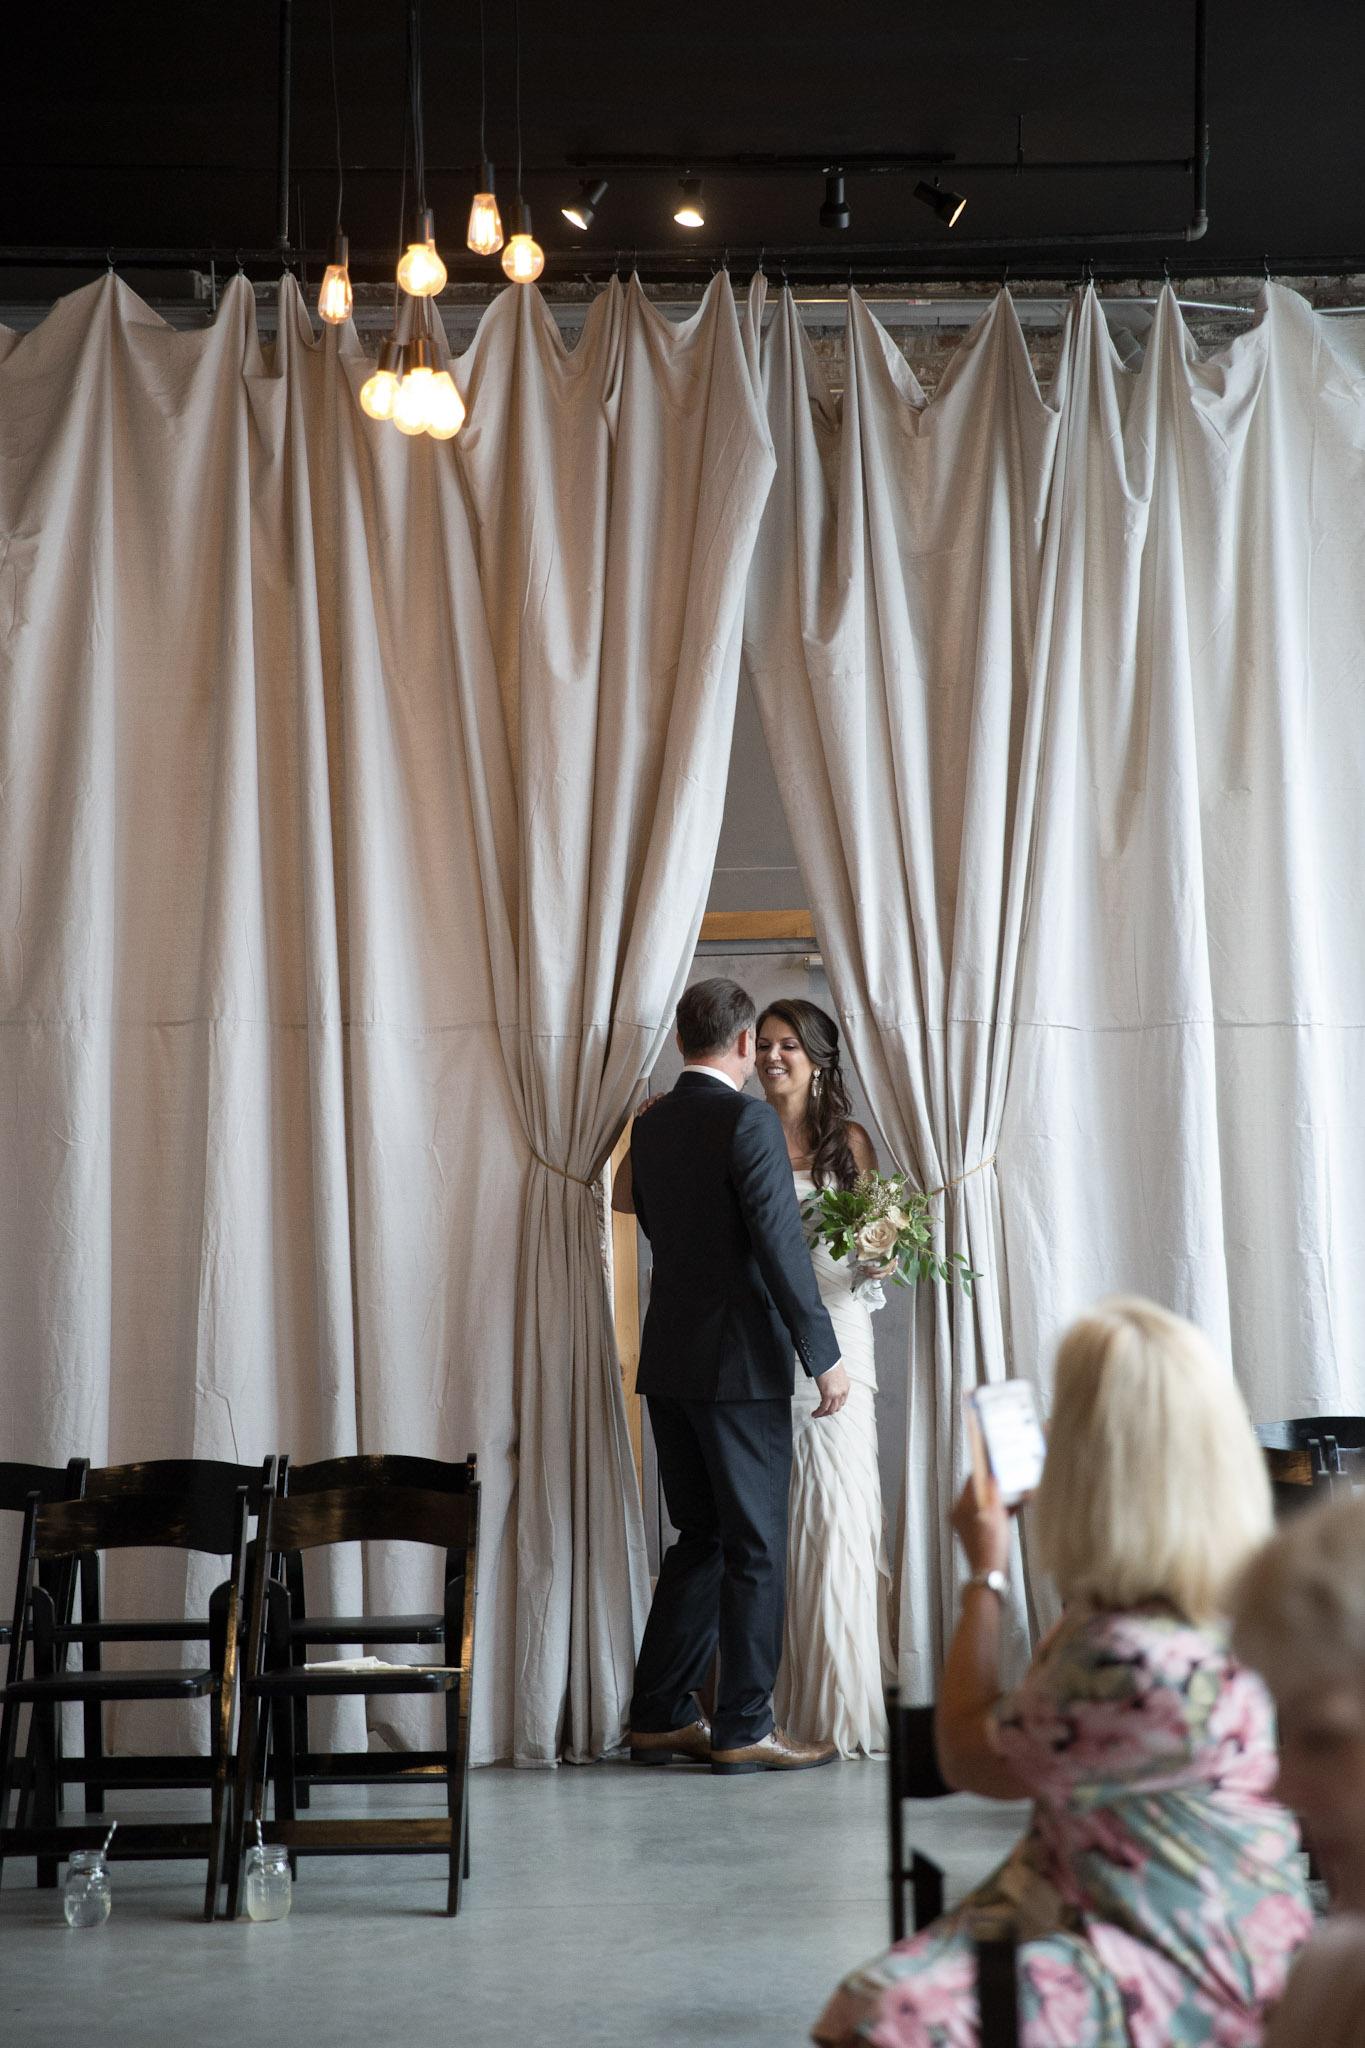 The_Vow_Exchange_Kansas_City_Small_Budget_Wedding_Venue_Kiersten&Brice_IMG-15.jpg